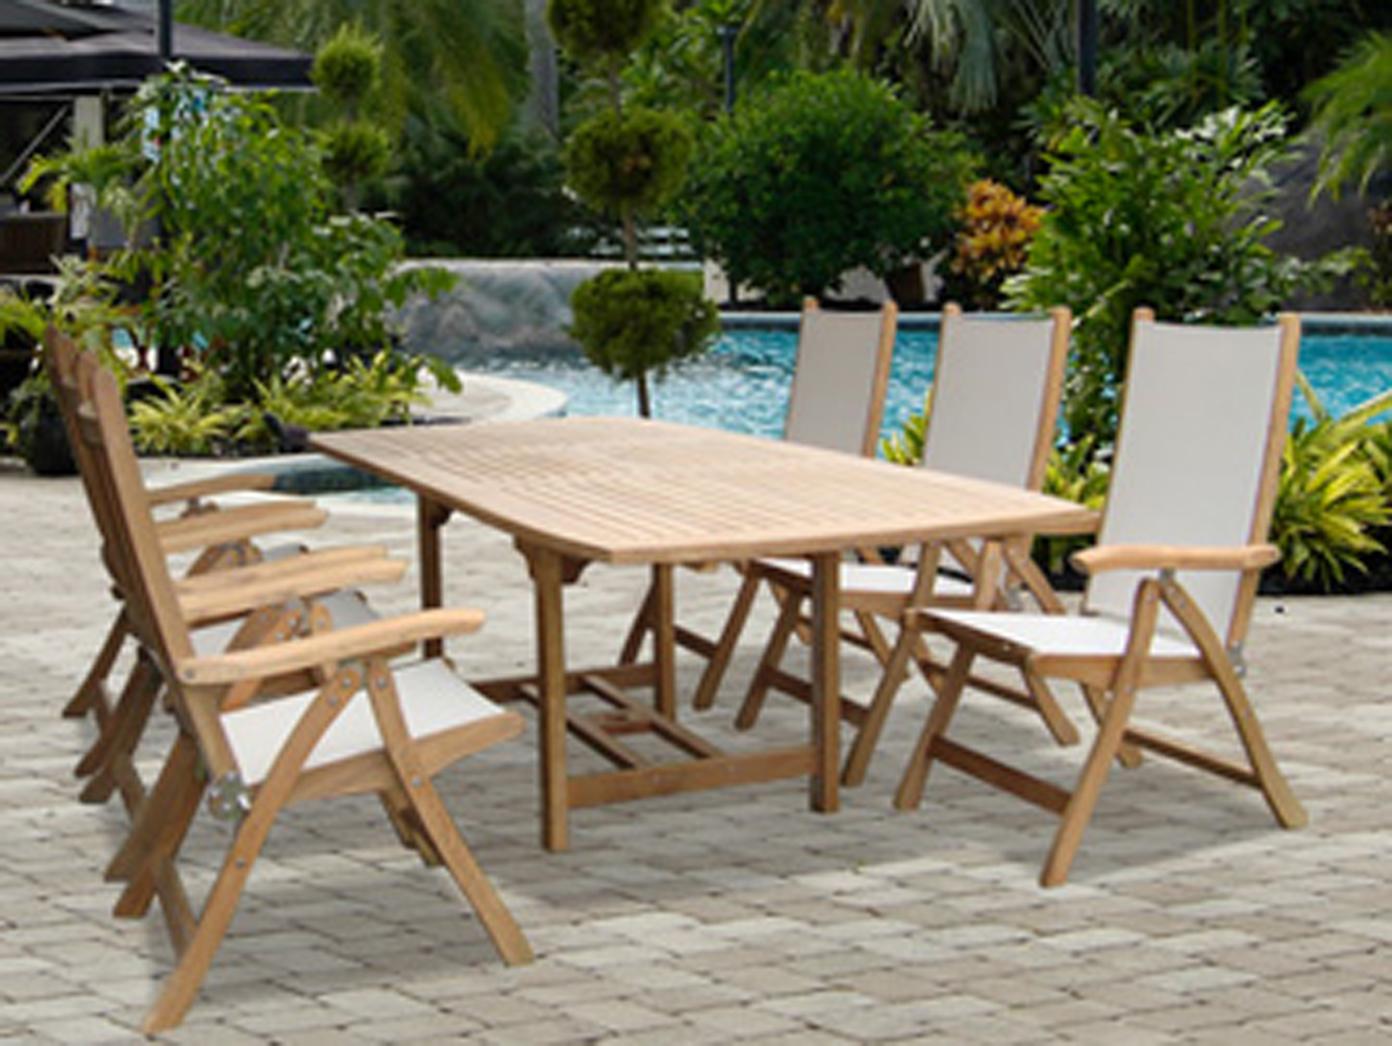 Rectangular Teak Extension Table Set Outdoor Teak More - Teak extension table outdoor